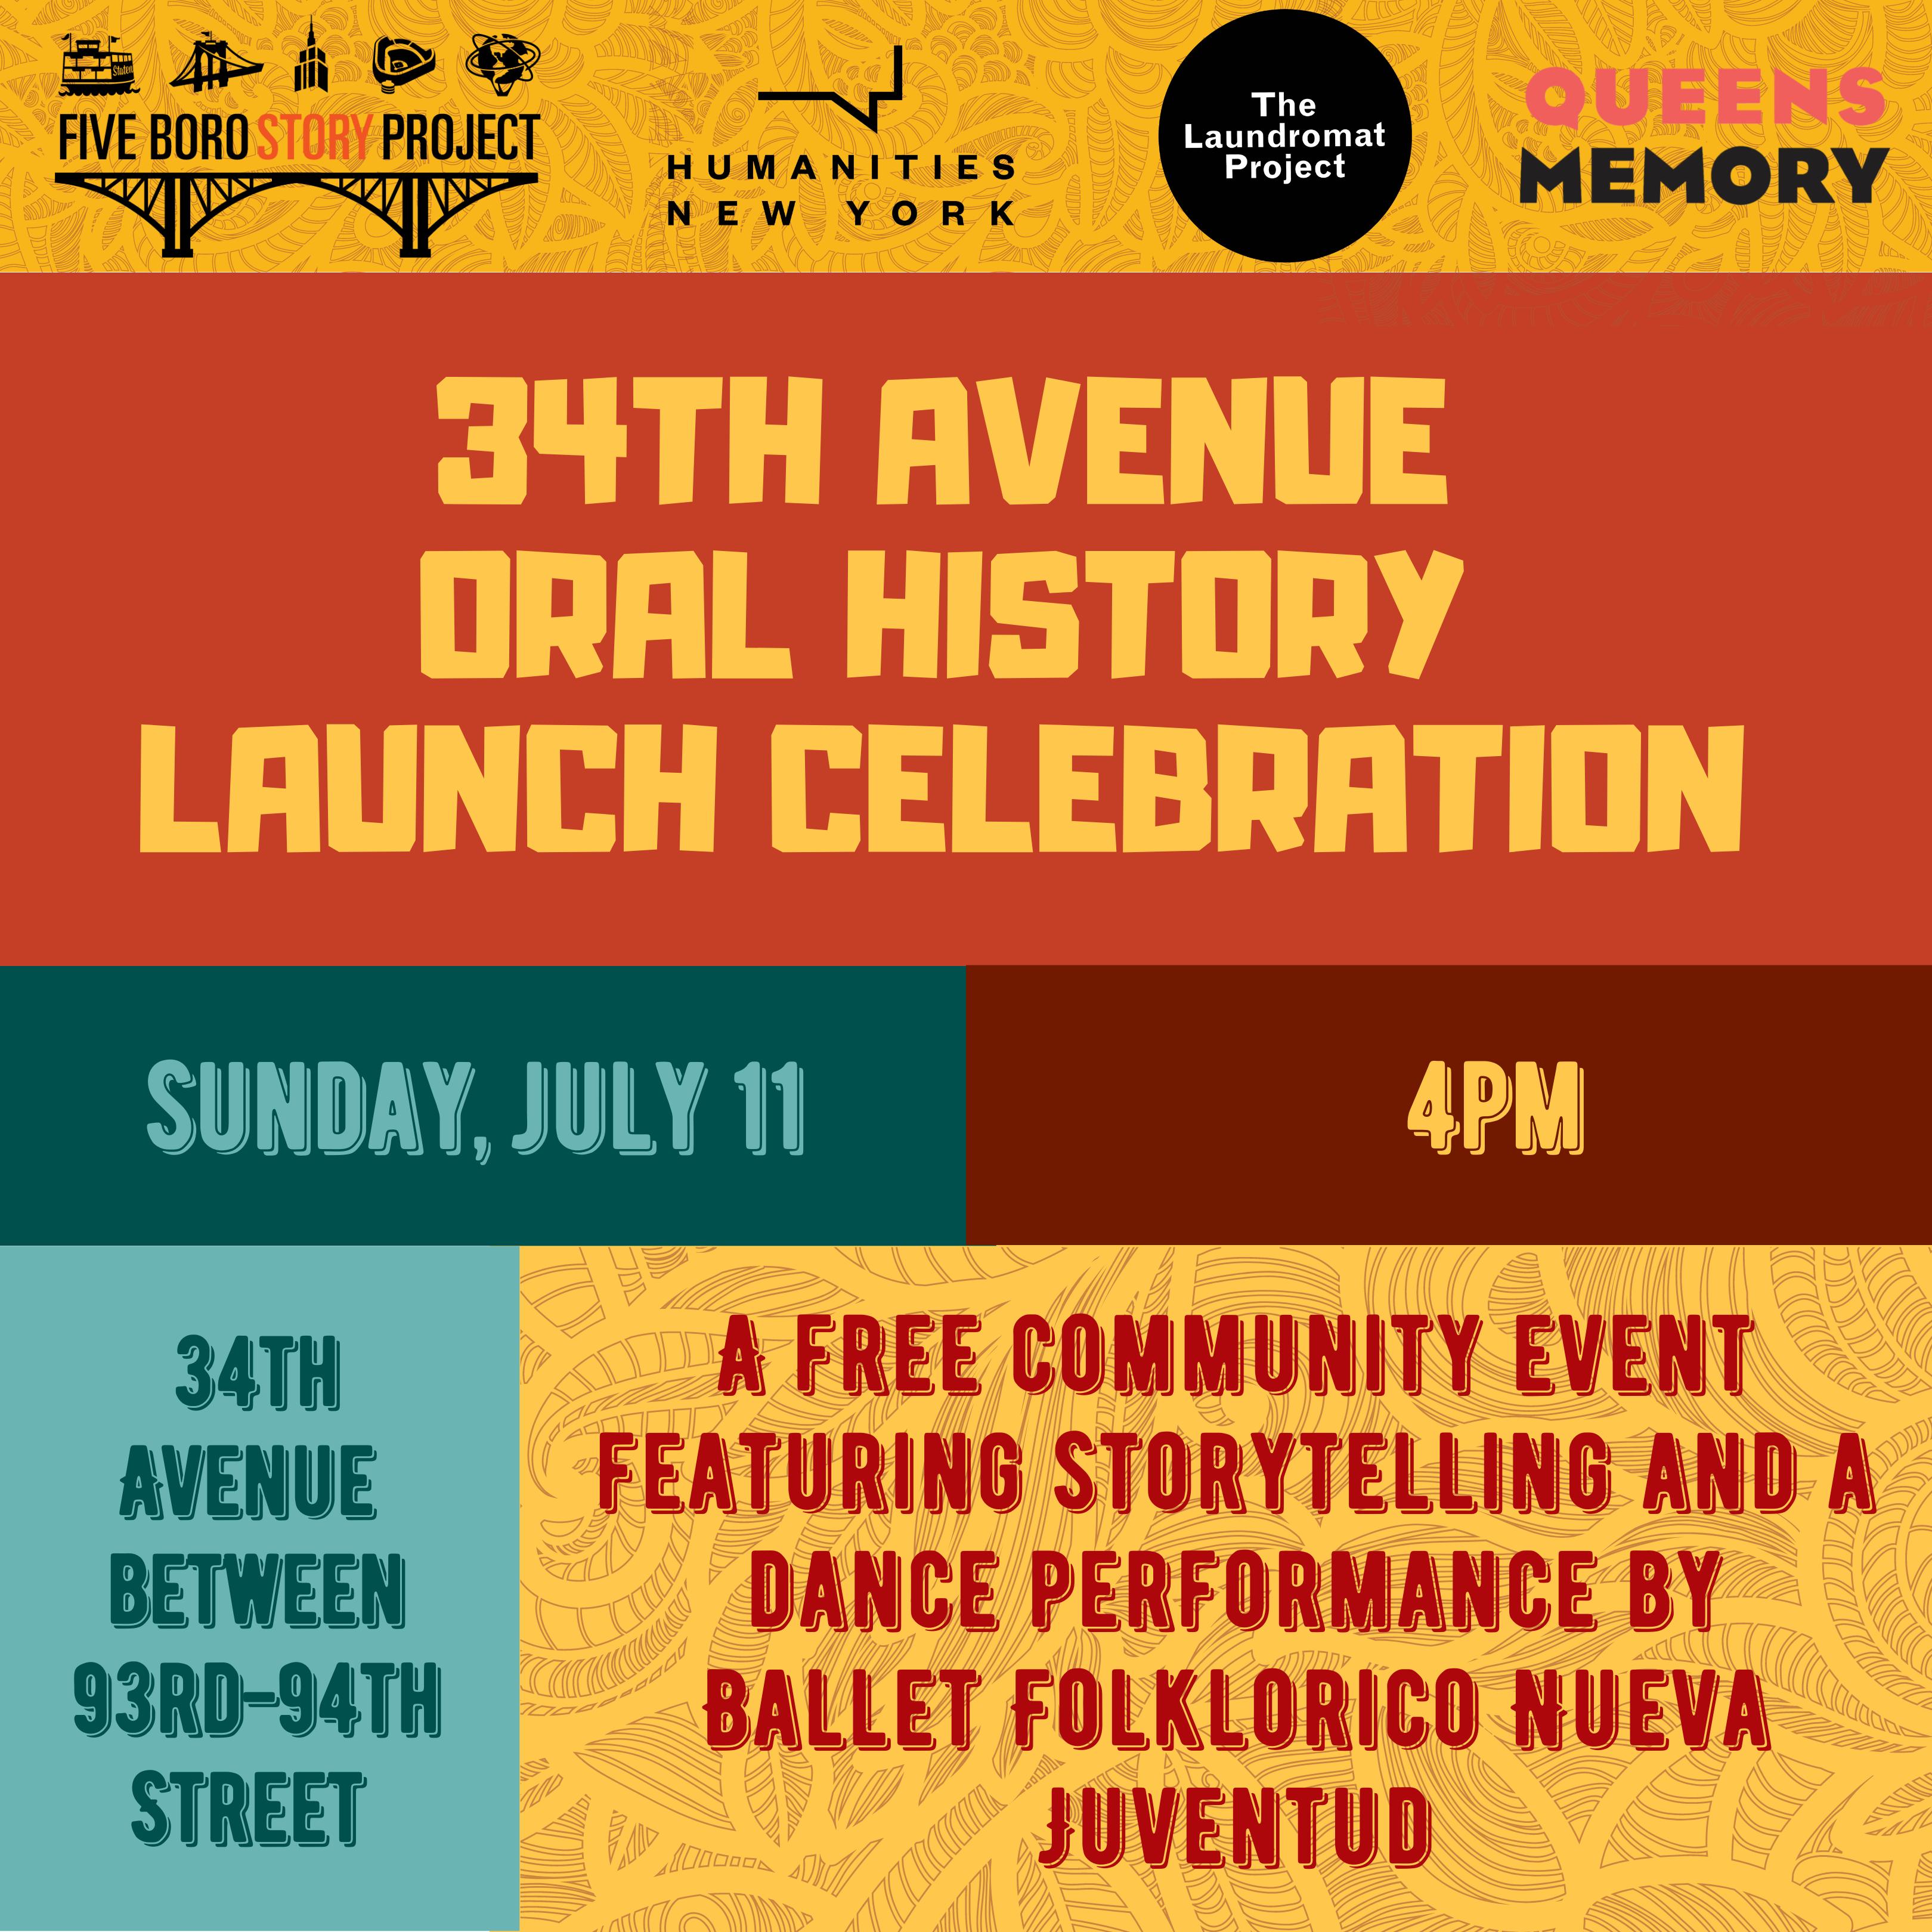 34th avenue oral history launch celebration